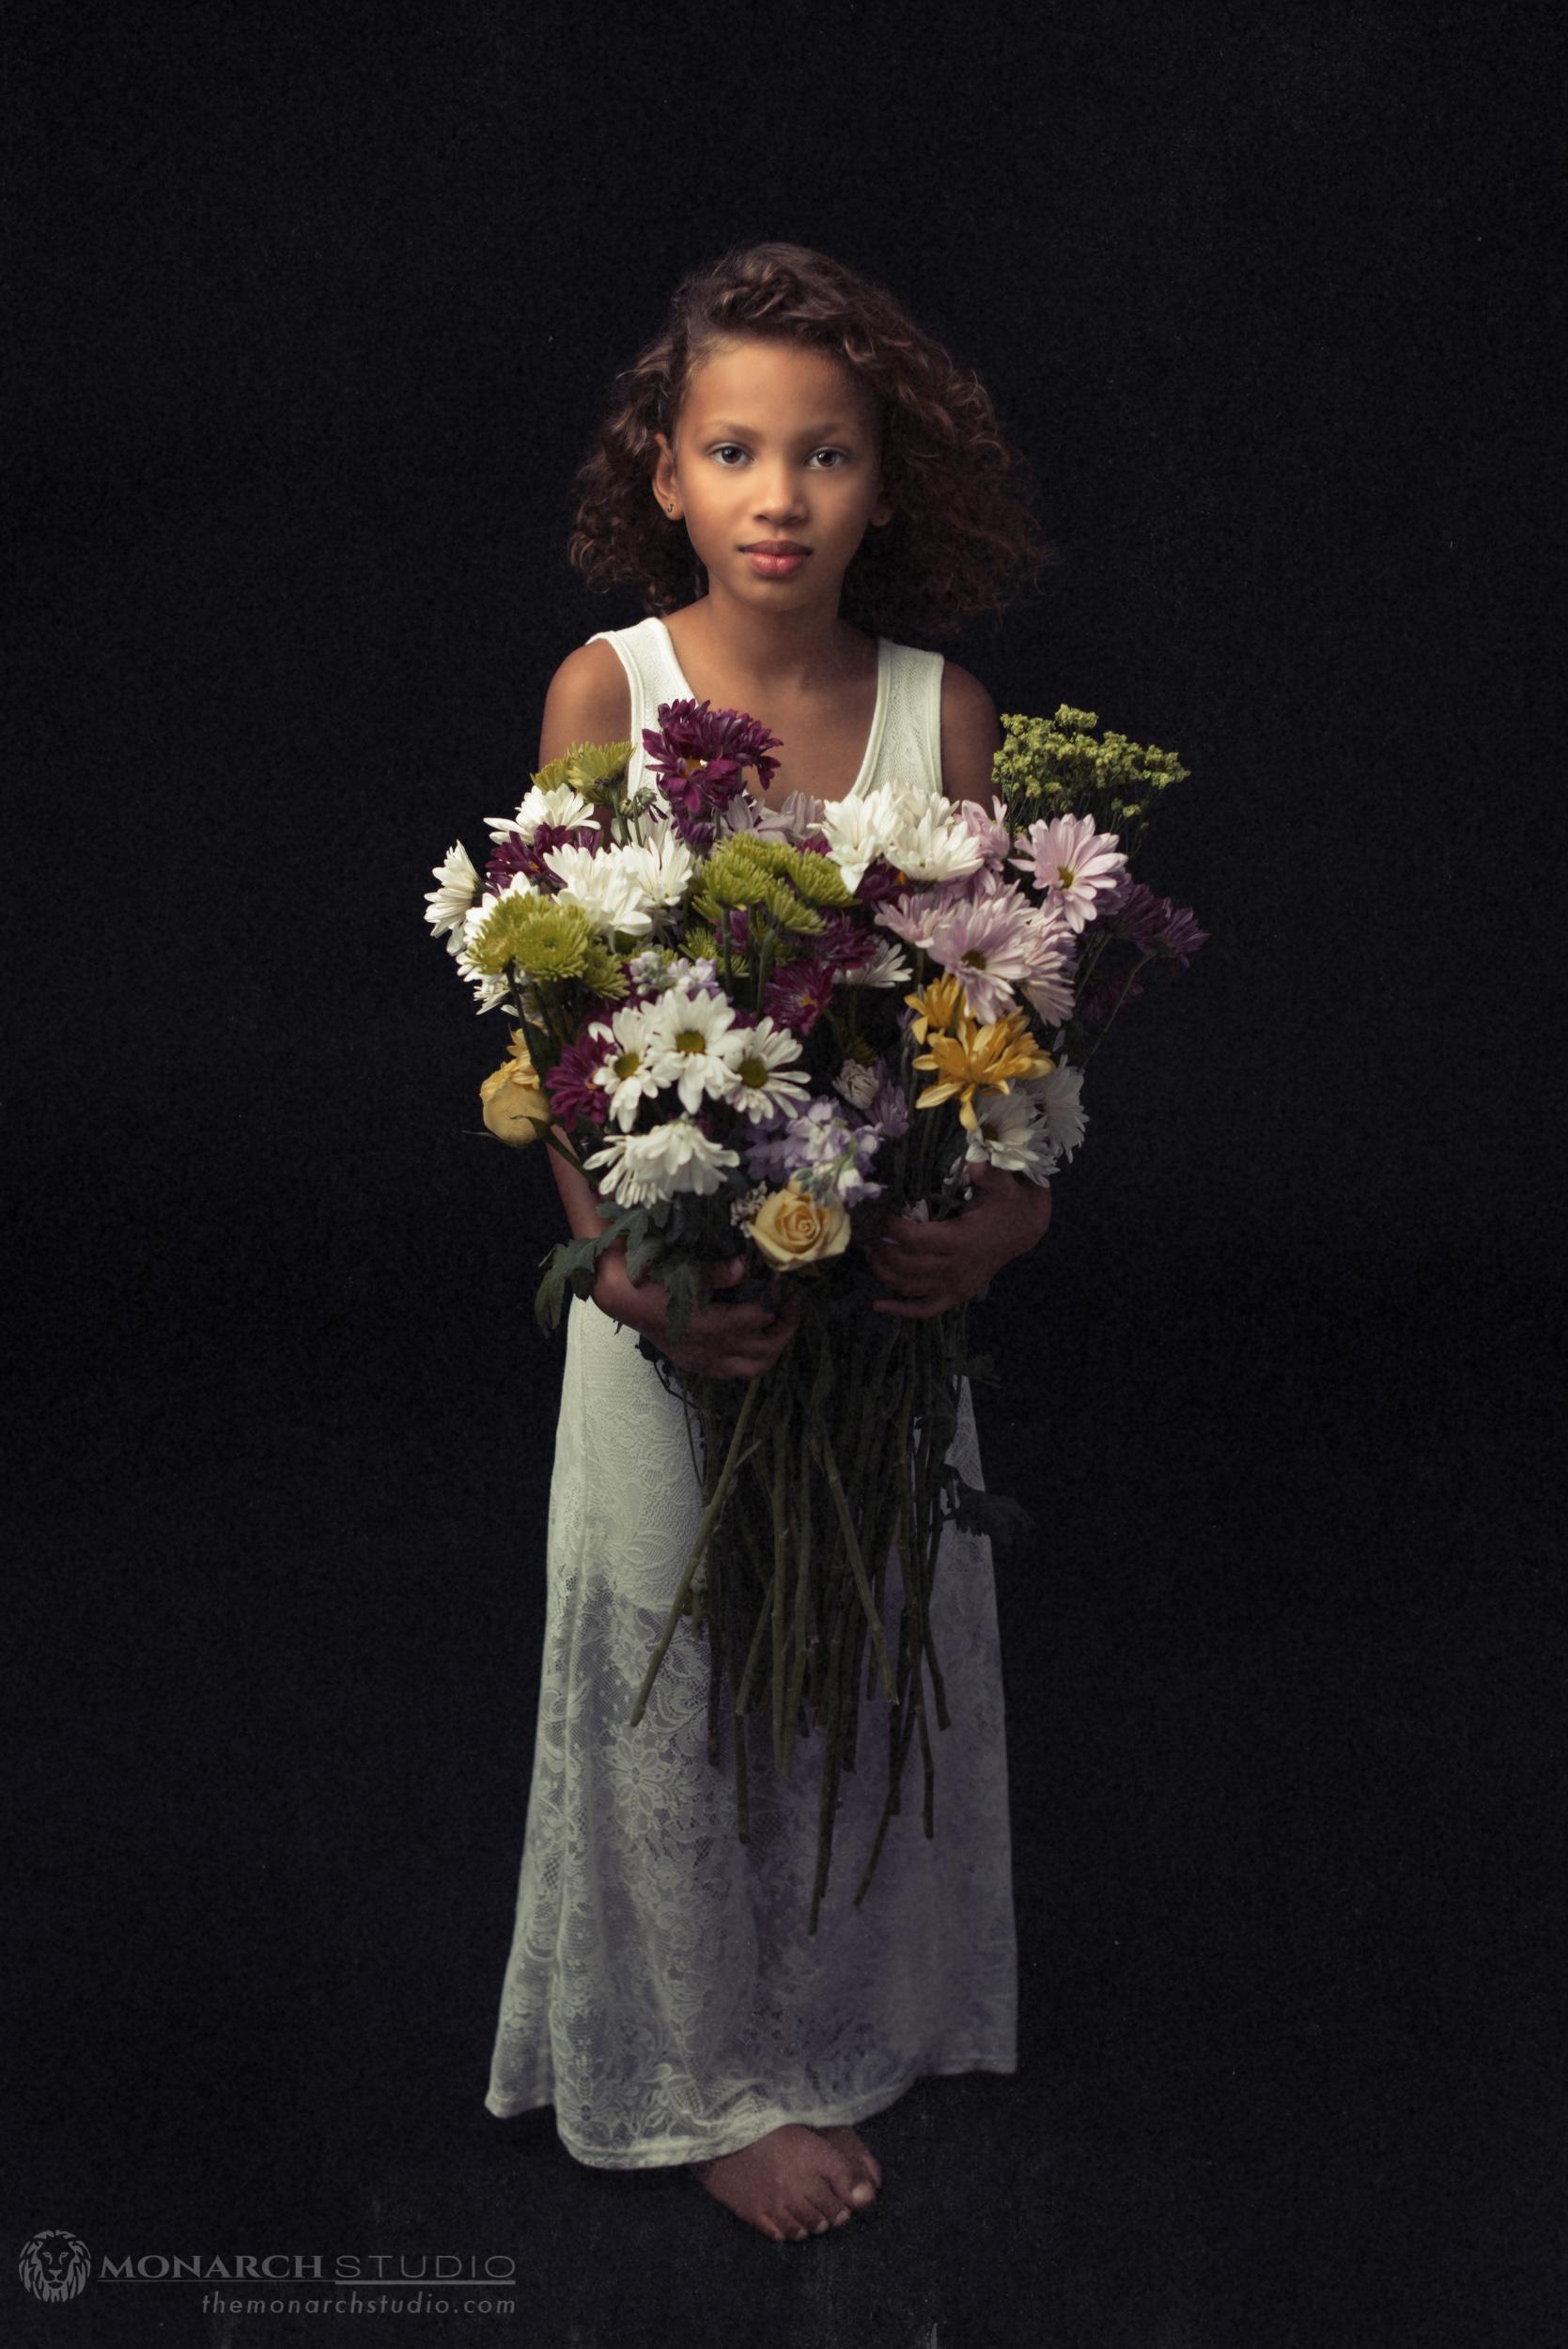 Fine-Art-Childrens-Photographer-8.jpg